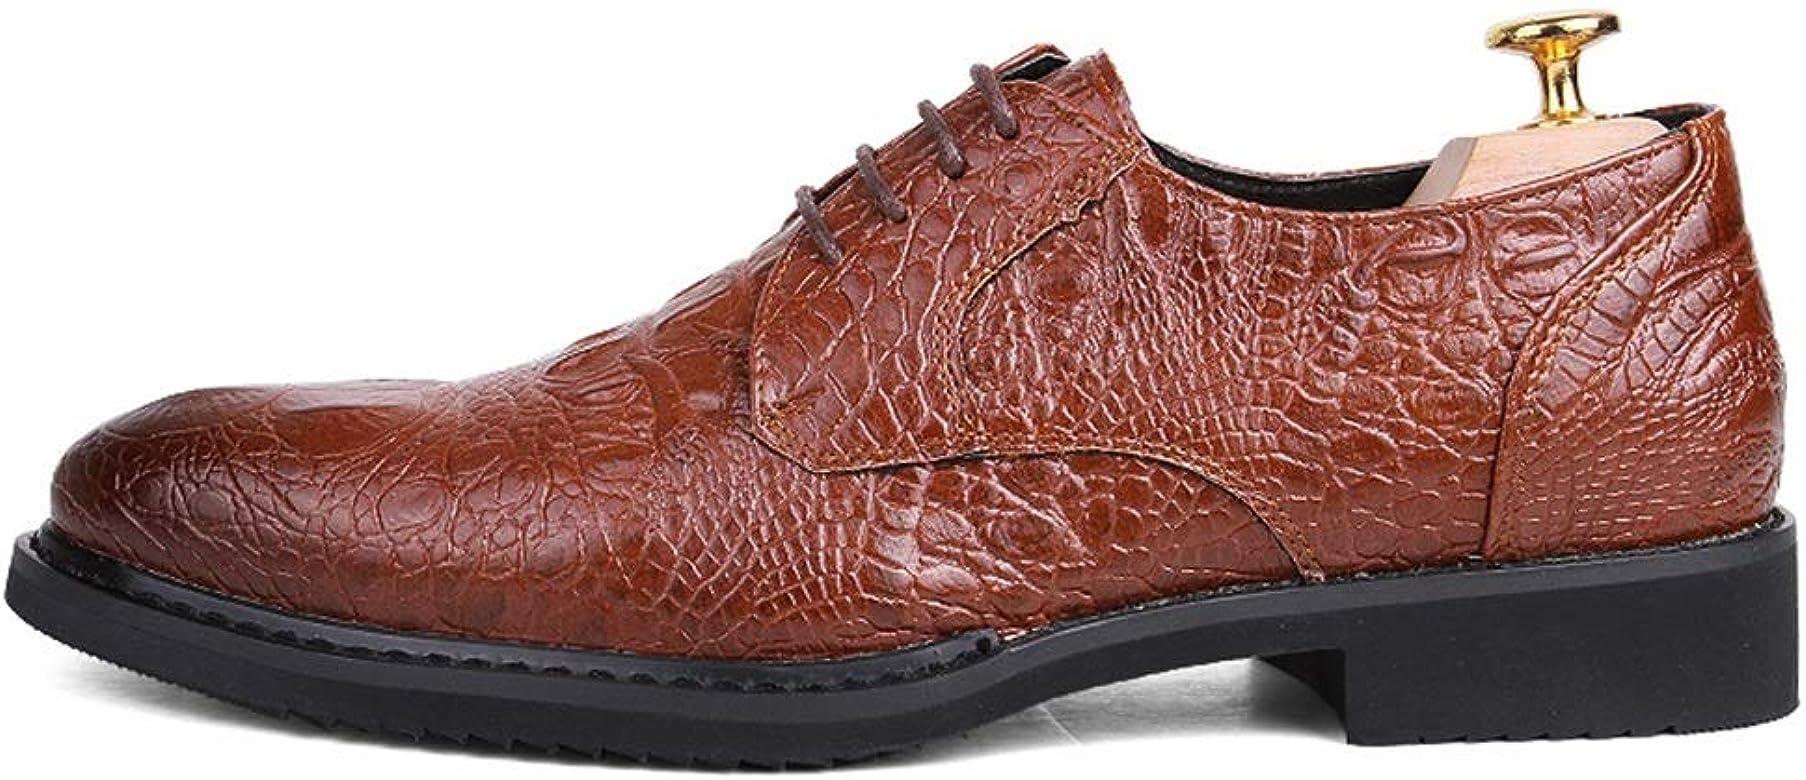 Zapatos para Hombres Oxford Casual Puntiagudo Cómodo